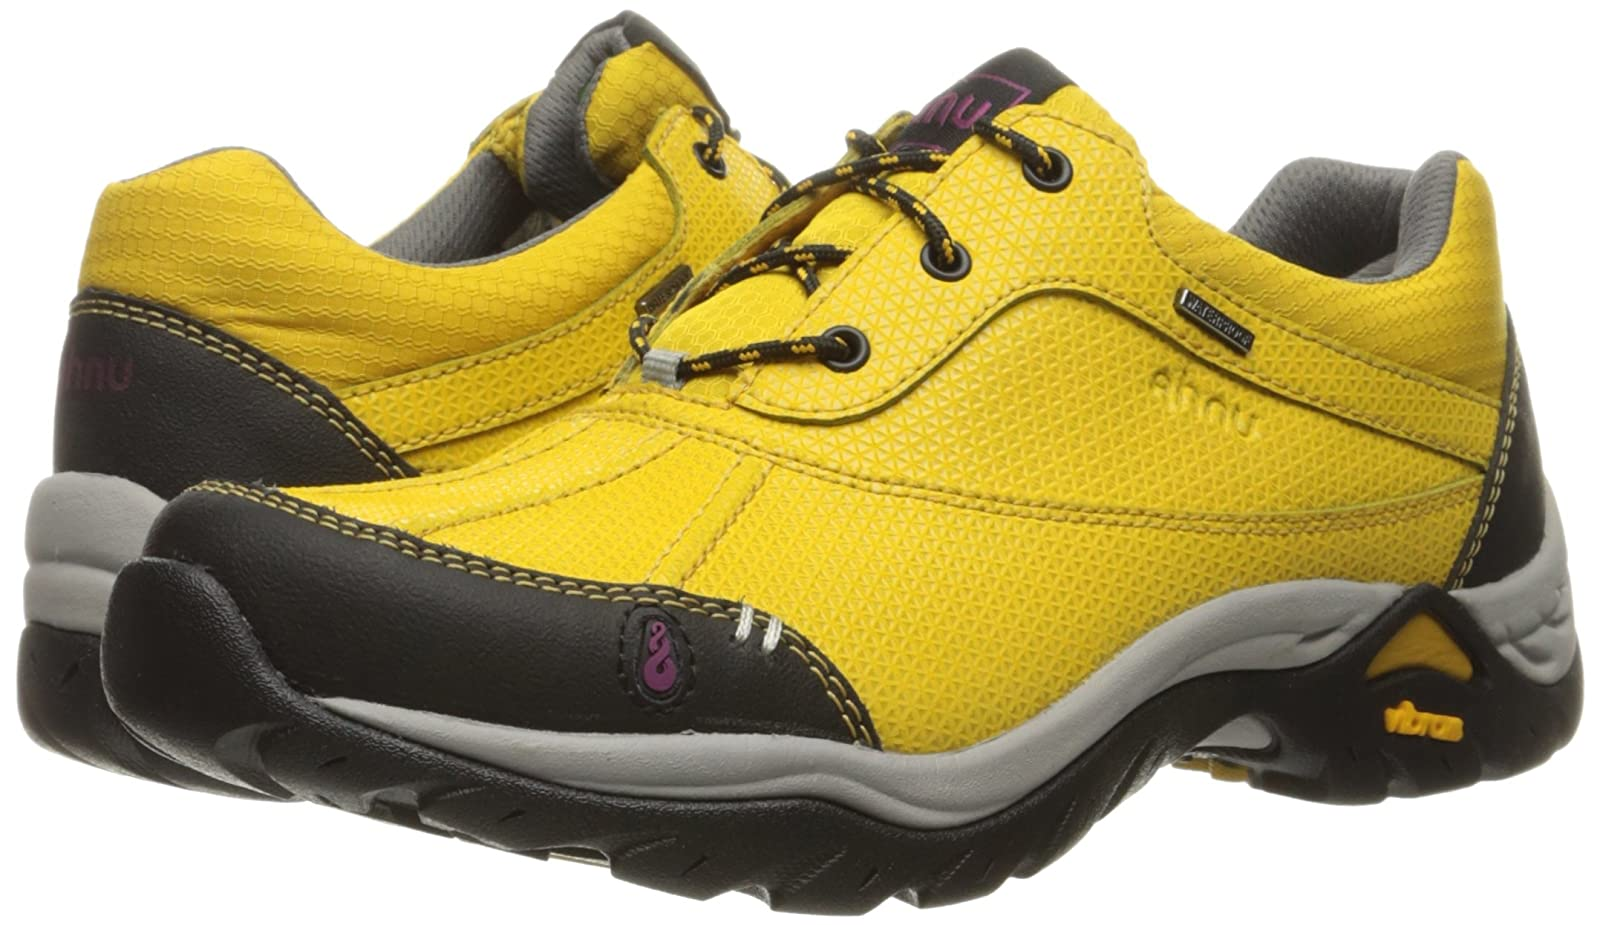 Ahnu Women's Calaveras Waterproof Hiking Shoe 5 M US - 6